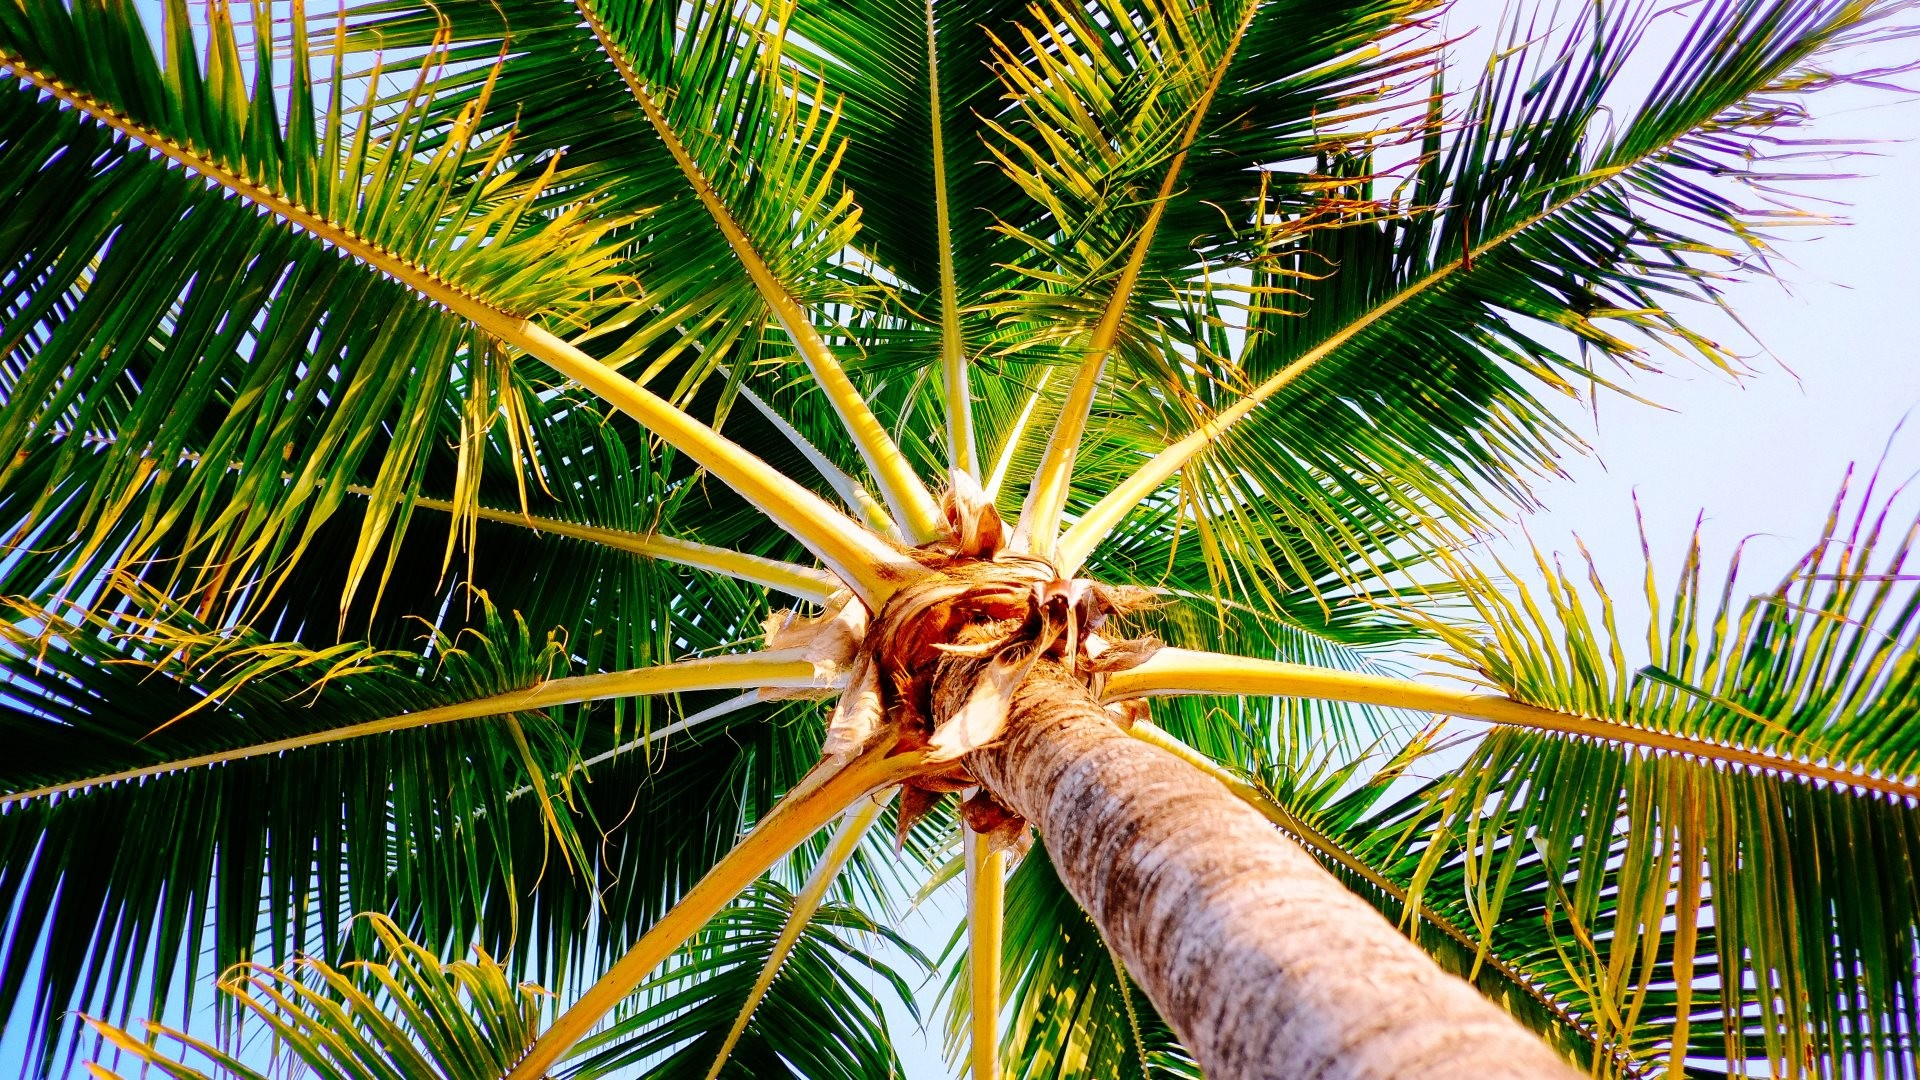 Jamaica wallpaper screensavers 53 images - Free palm tree screensavers ...